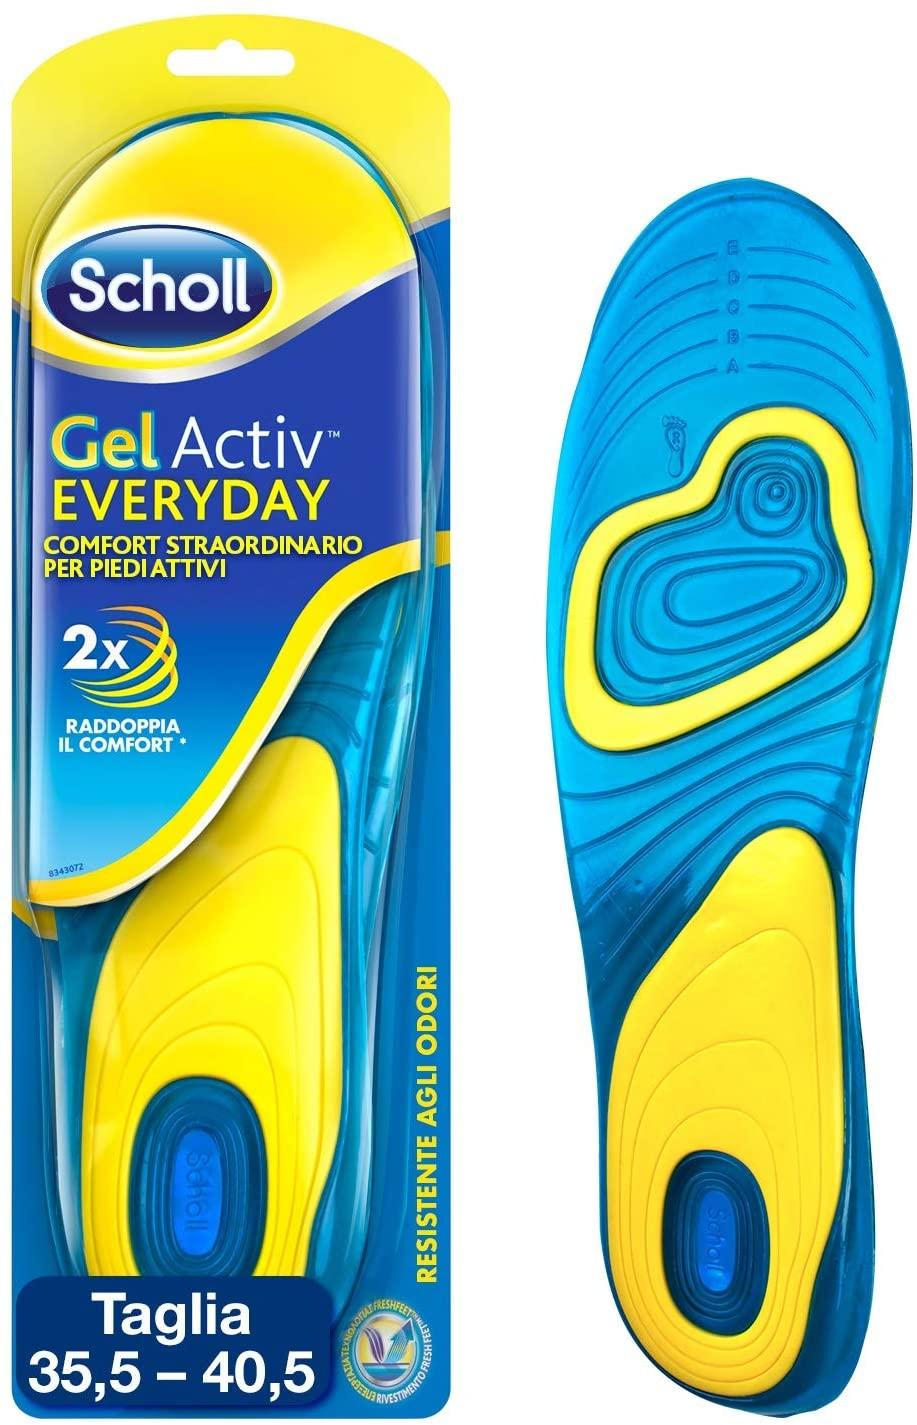 Solette Doctor Scholl Amazon